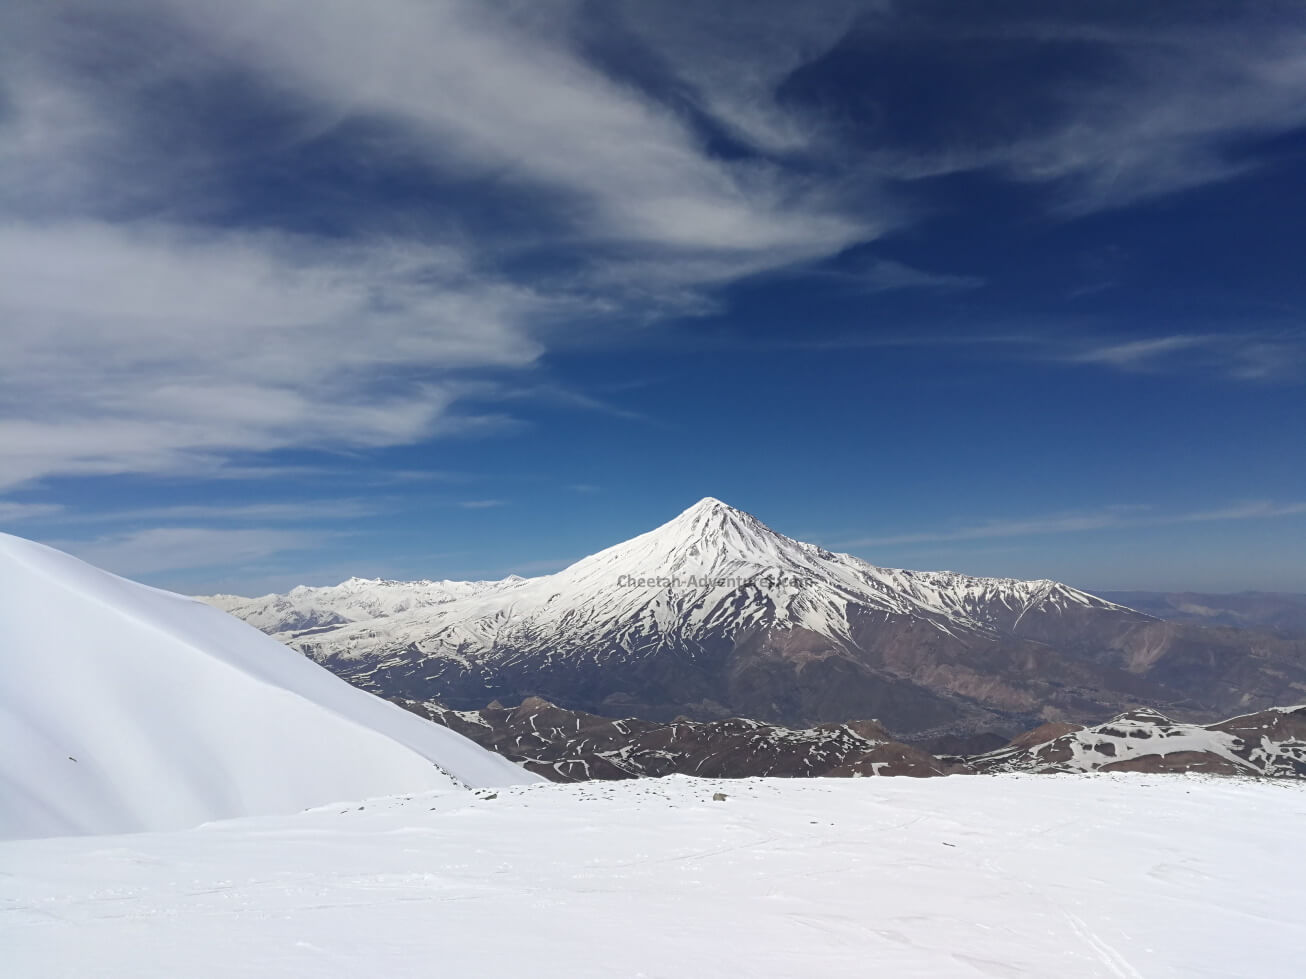 A brilliant view of Damavand (5610m) from the top of Doberar Peak (4250m) Mount Damavand Elevation height relative